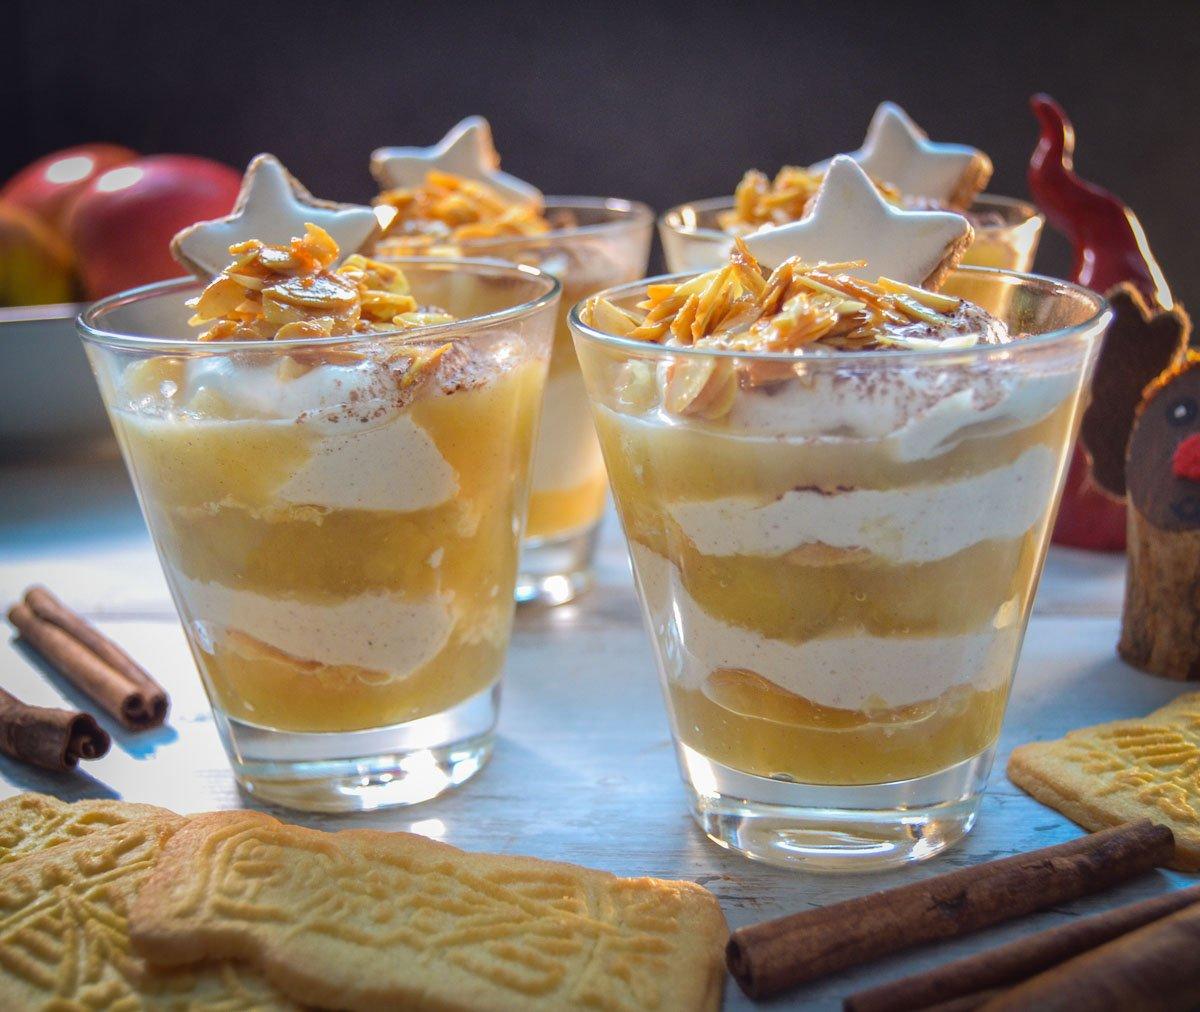 Apfel Tiramisu Dessert im Glas mit Mascarpone Quarkcreme und Spekulatius